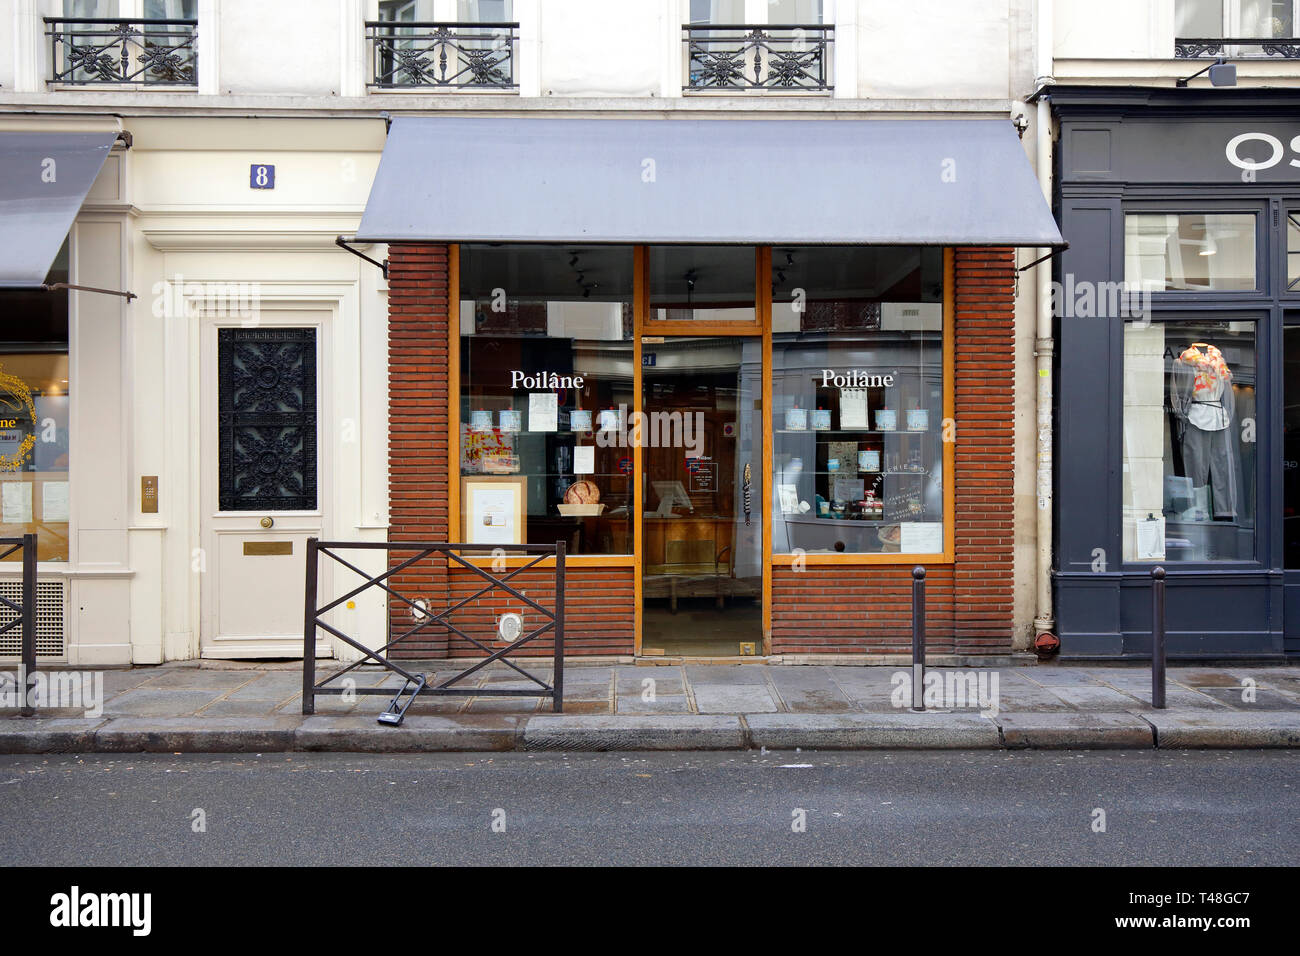 23 Rue Du Cherche Midi paris bakery stock photos & paris bakery stock images - alamy